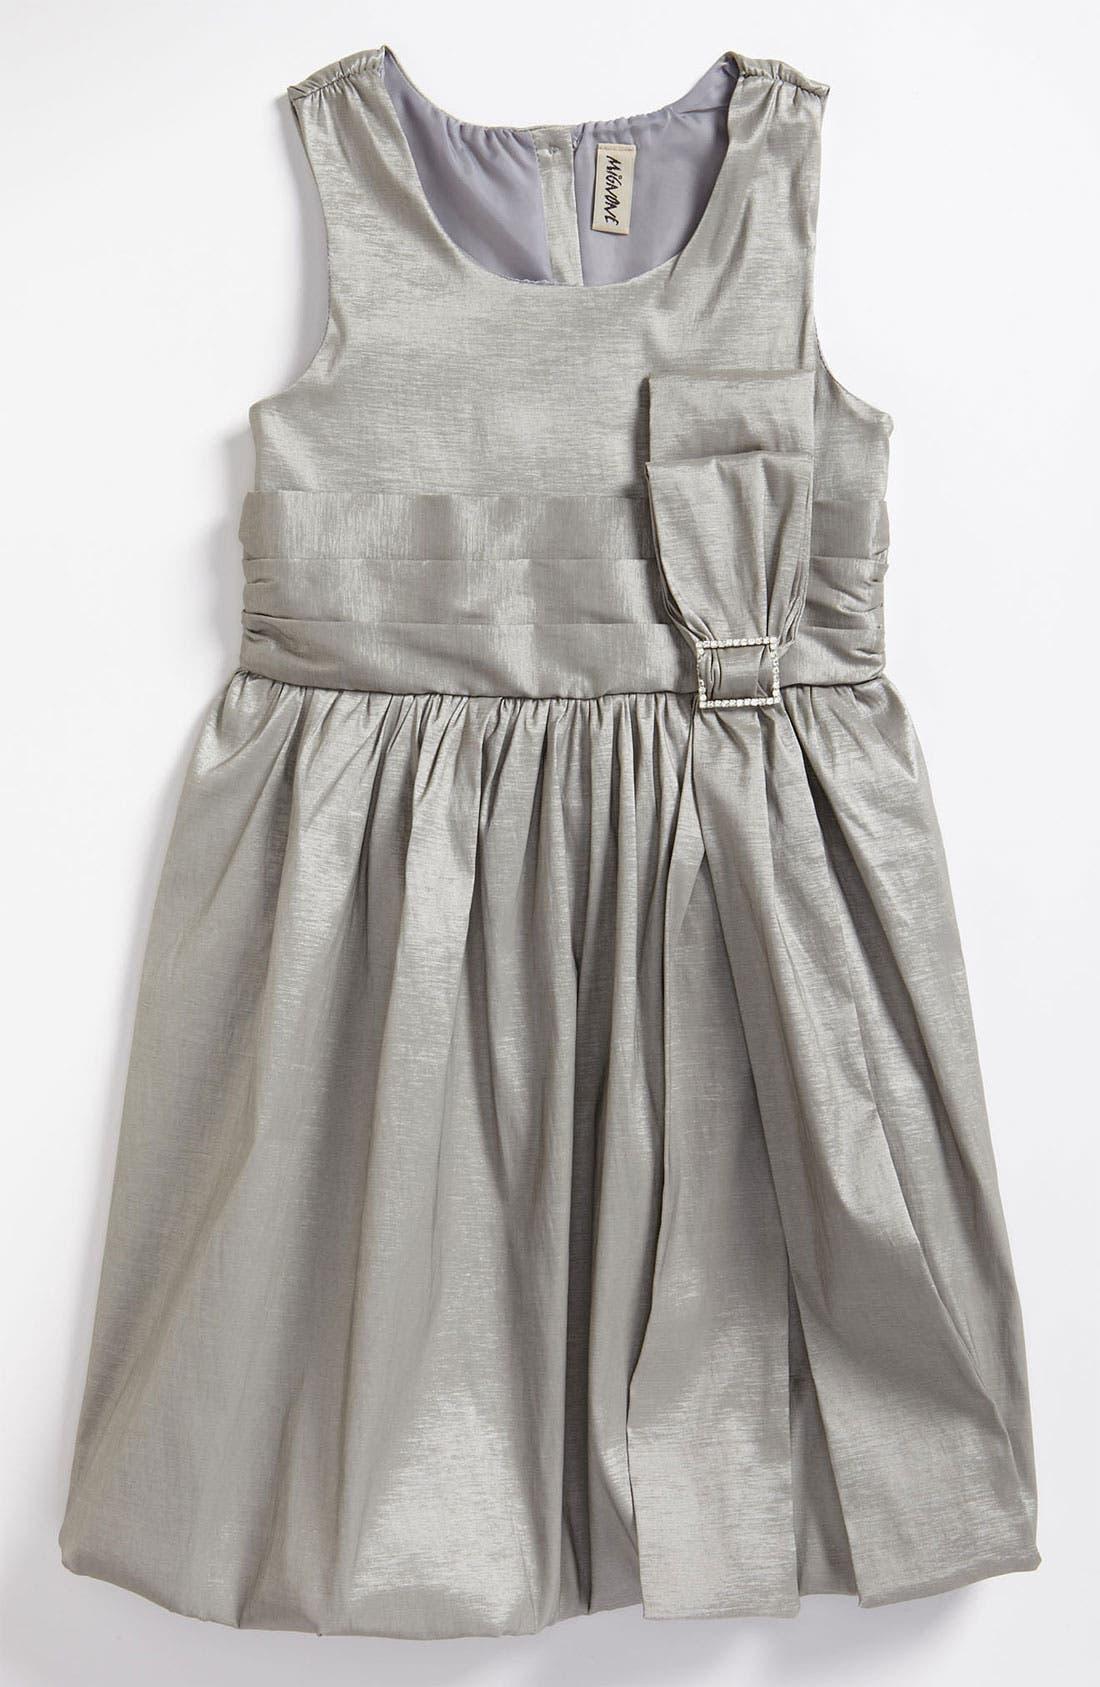 Main Image - Mignone Taffeta Dress (Little Girls & Big Girls)